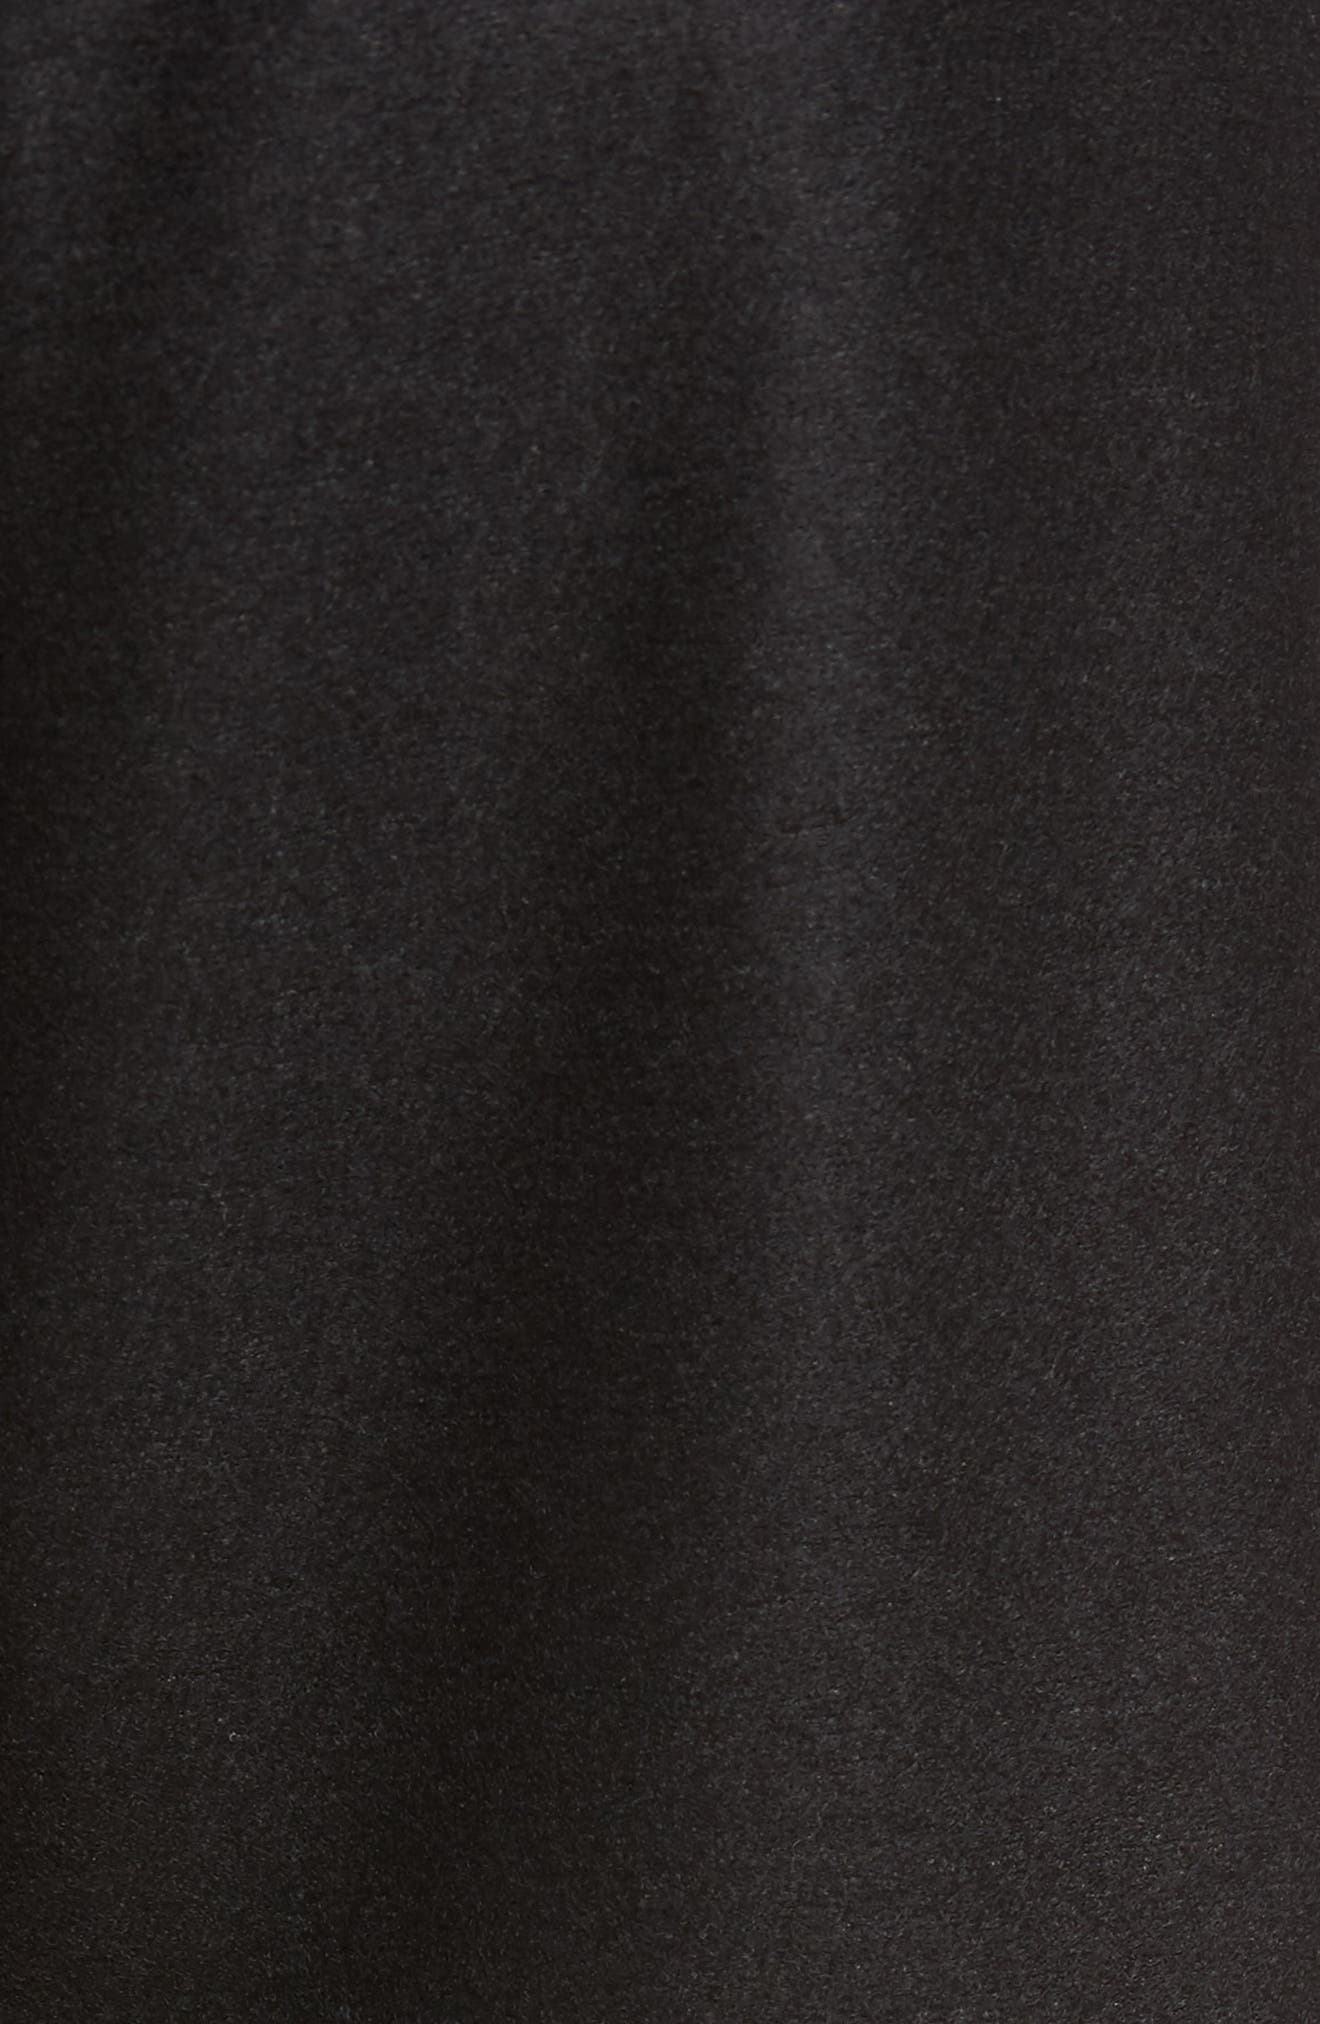 Drawstring Waist Pants,                             Alternate thumbnail 5, color,                             Black